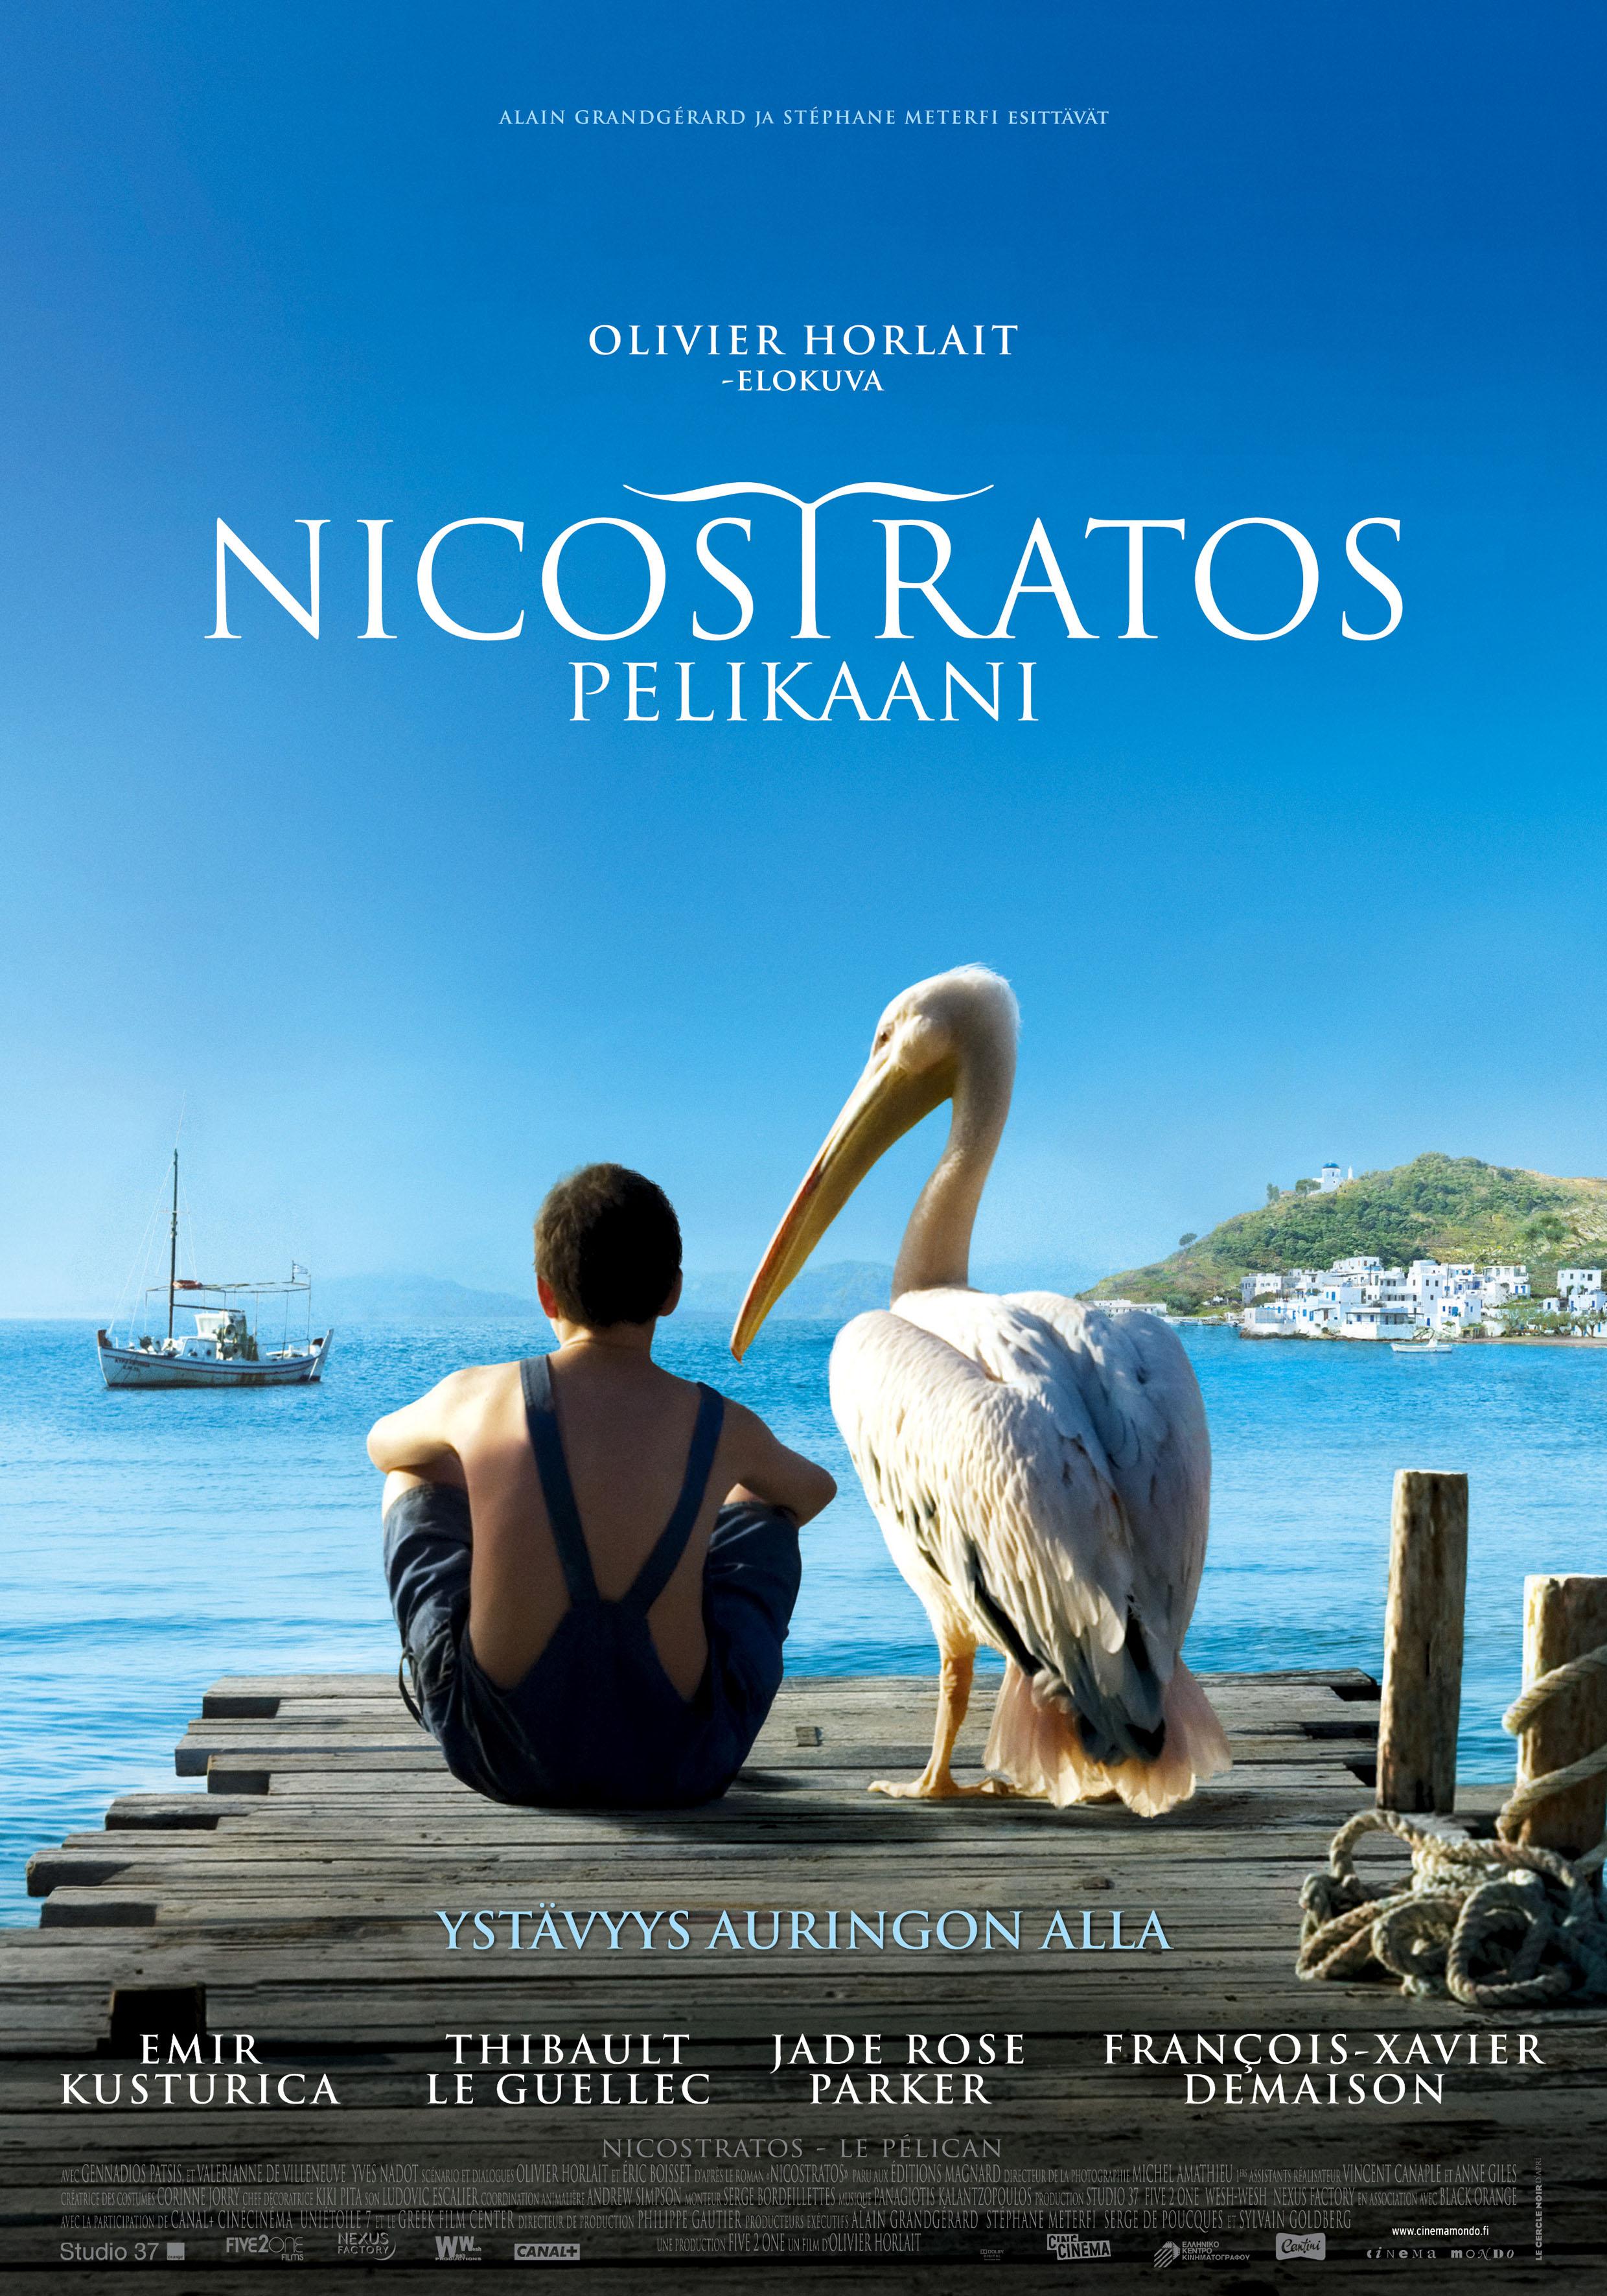 Nicostratos – pelikaani